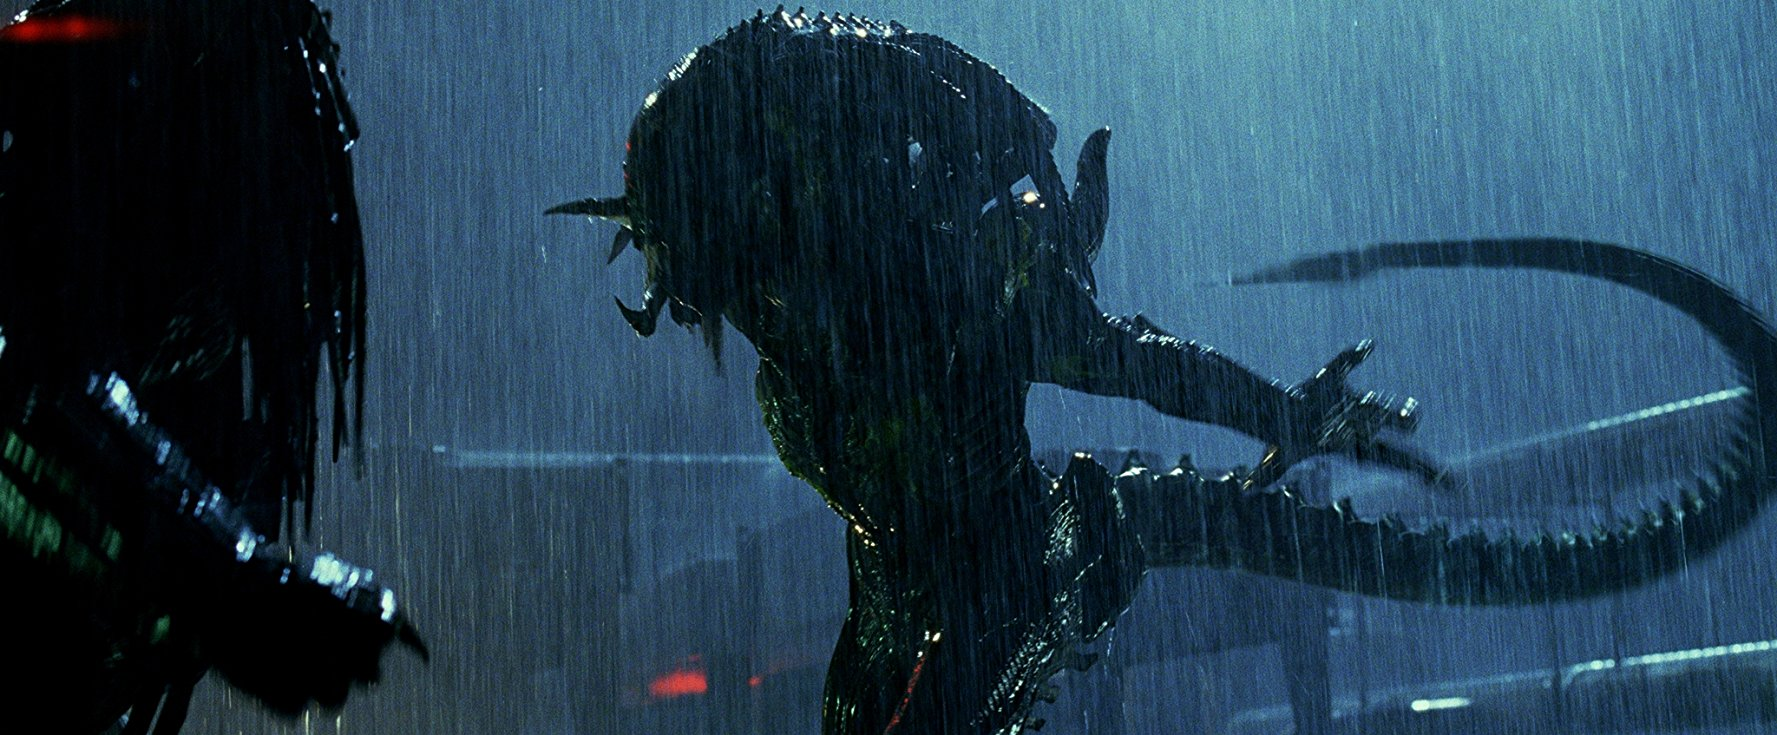 Alien fighting Predator in the rain at night in this frame from Aliens vs Predator: Requiem